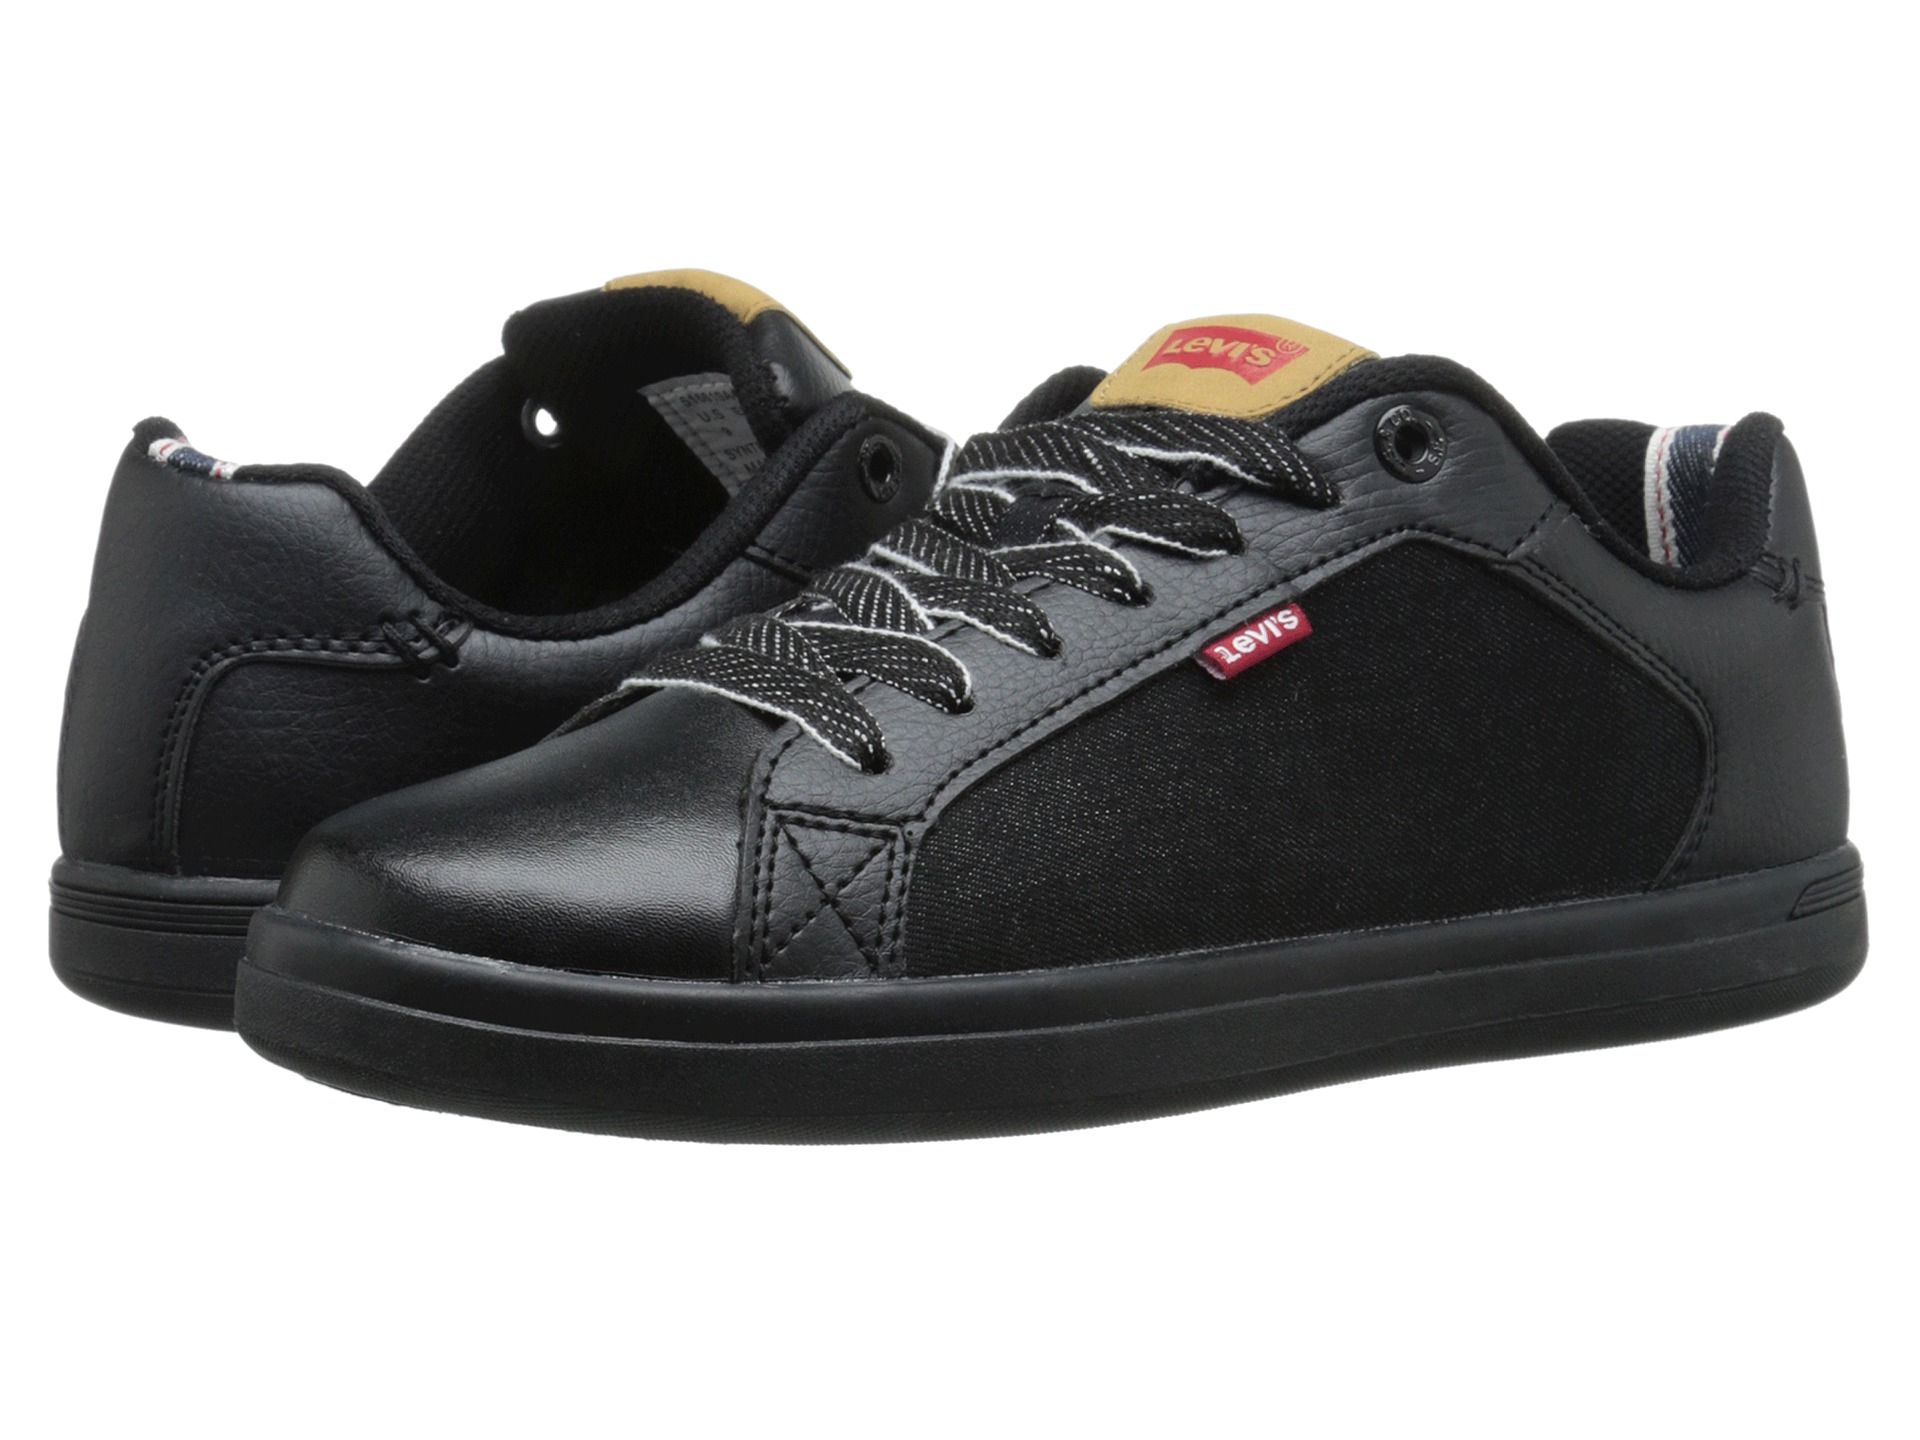 levi s 174 shoes westwood denim zappos free shipping